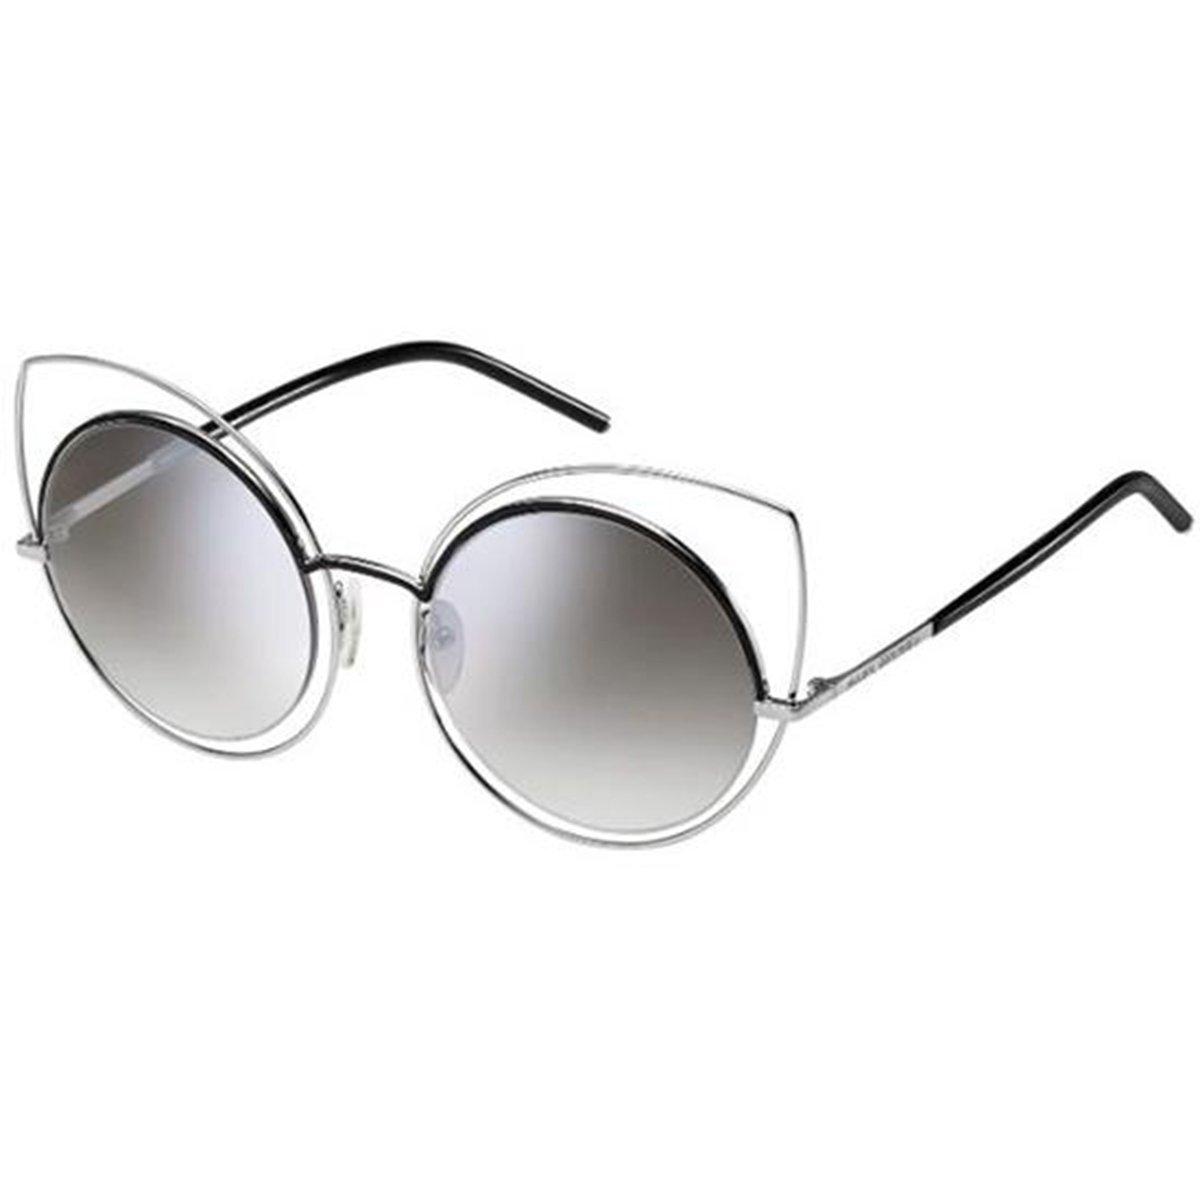 e7d5ef632b9b8 Compre Óculos de Sol Marc Jacobs em 10X   Tri-Jóia Shop